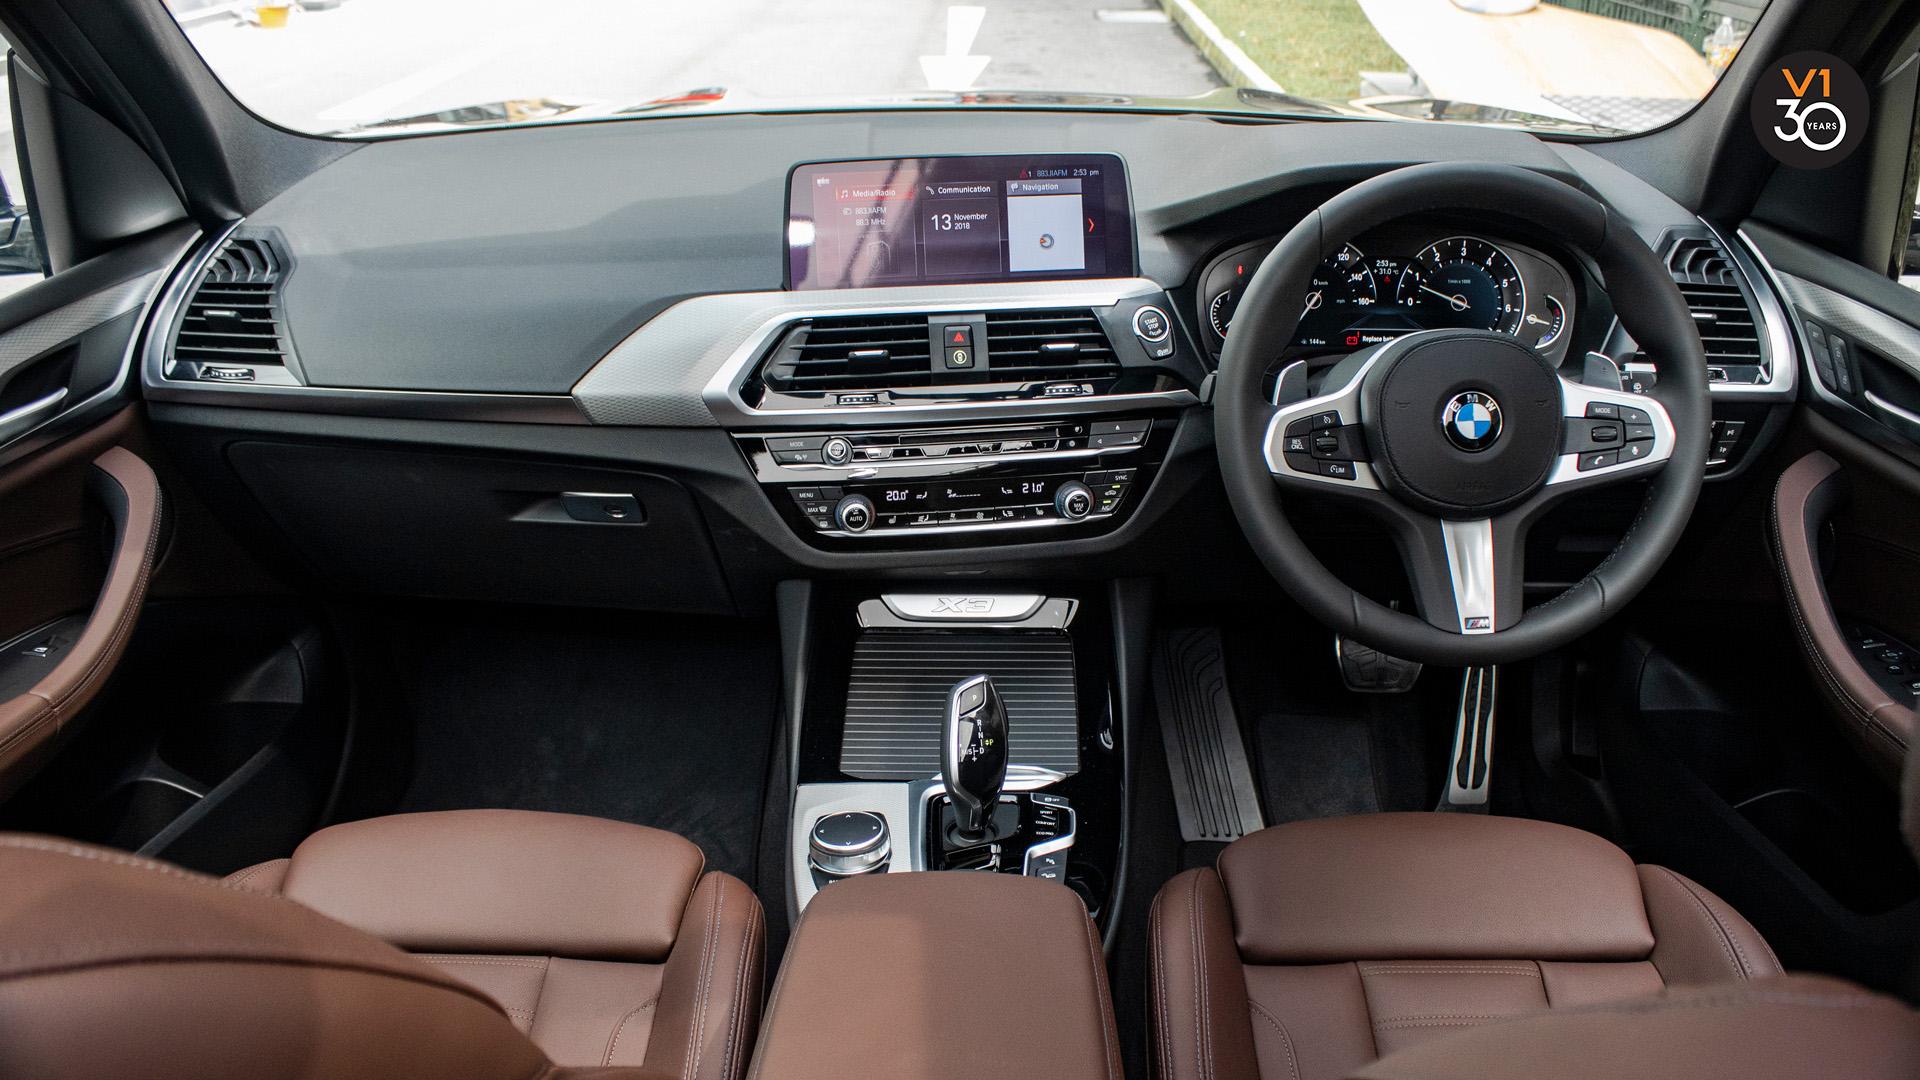 BMW X3 XDrive 2.0I M Sport - Interior Dash